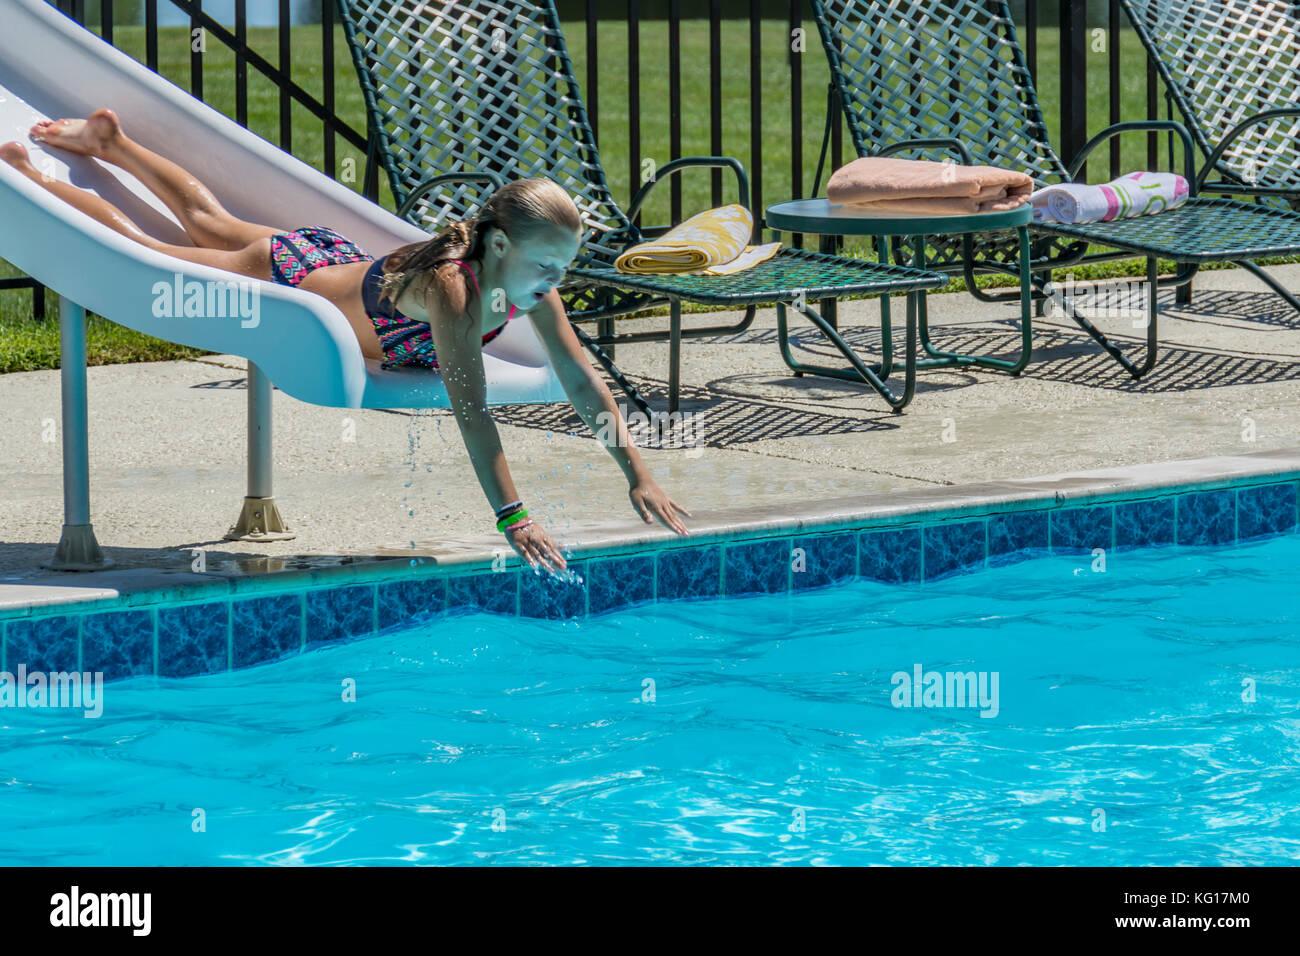 Young Girl Sliding Down A Pool Slide   Stock Image